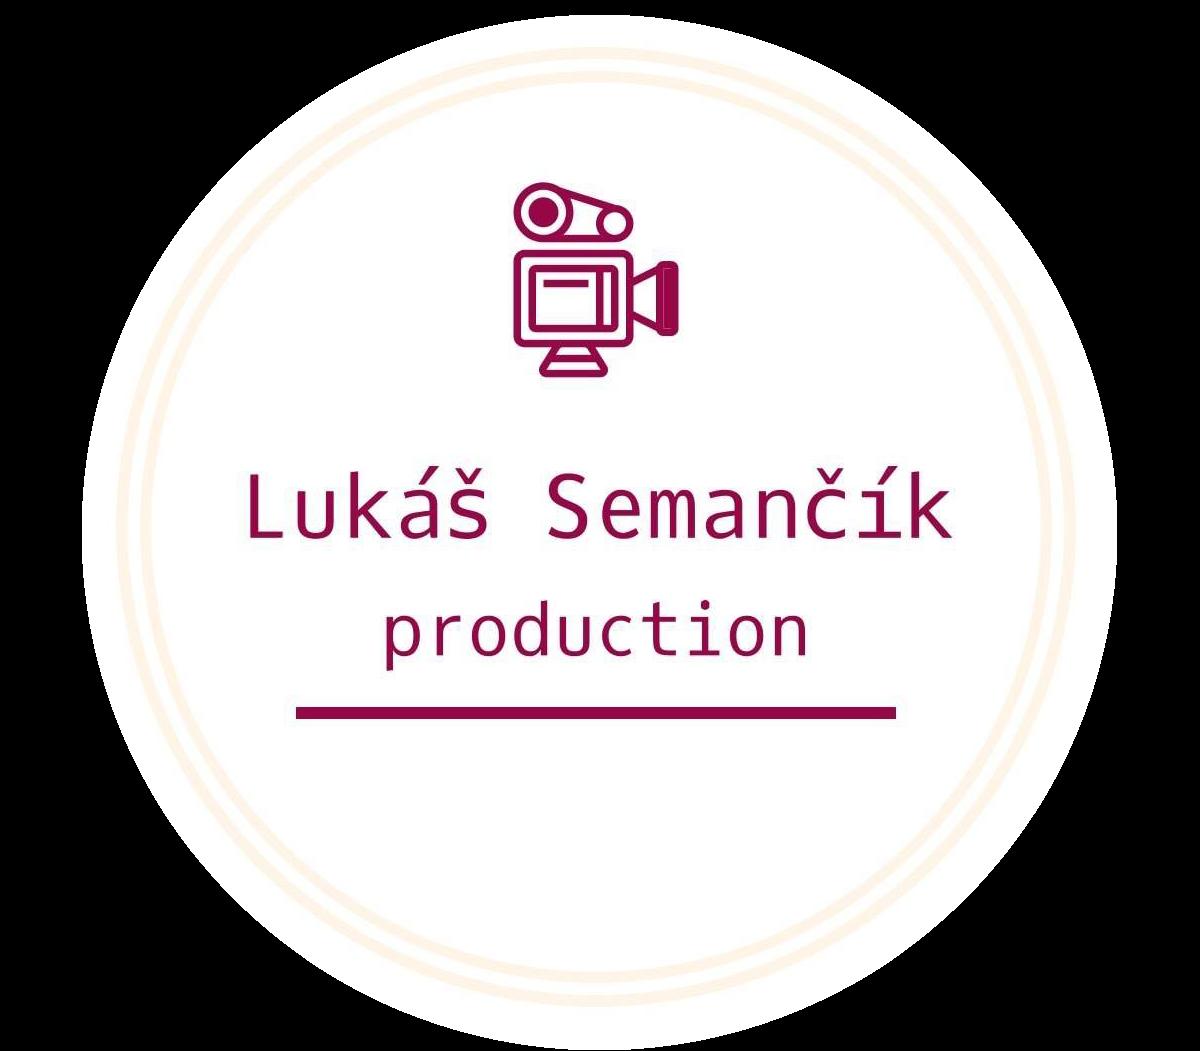 Lukáš Semančík